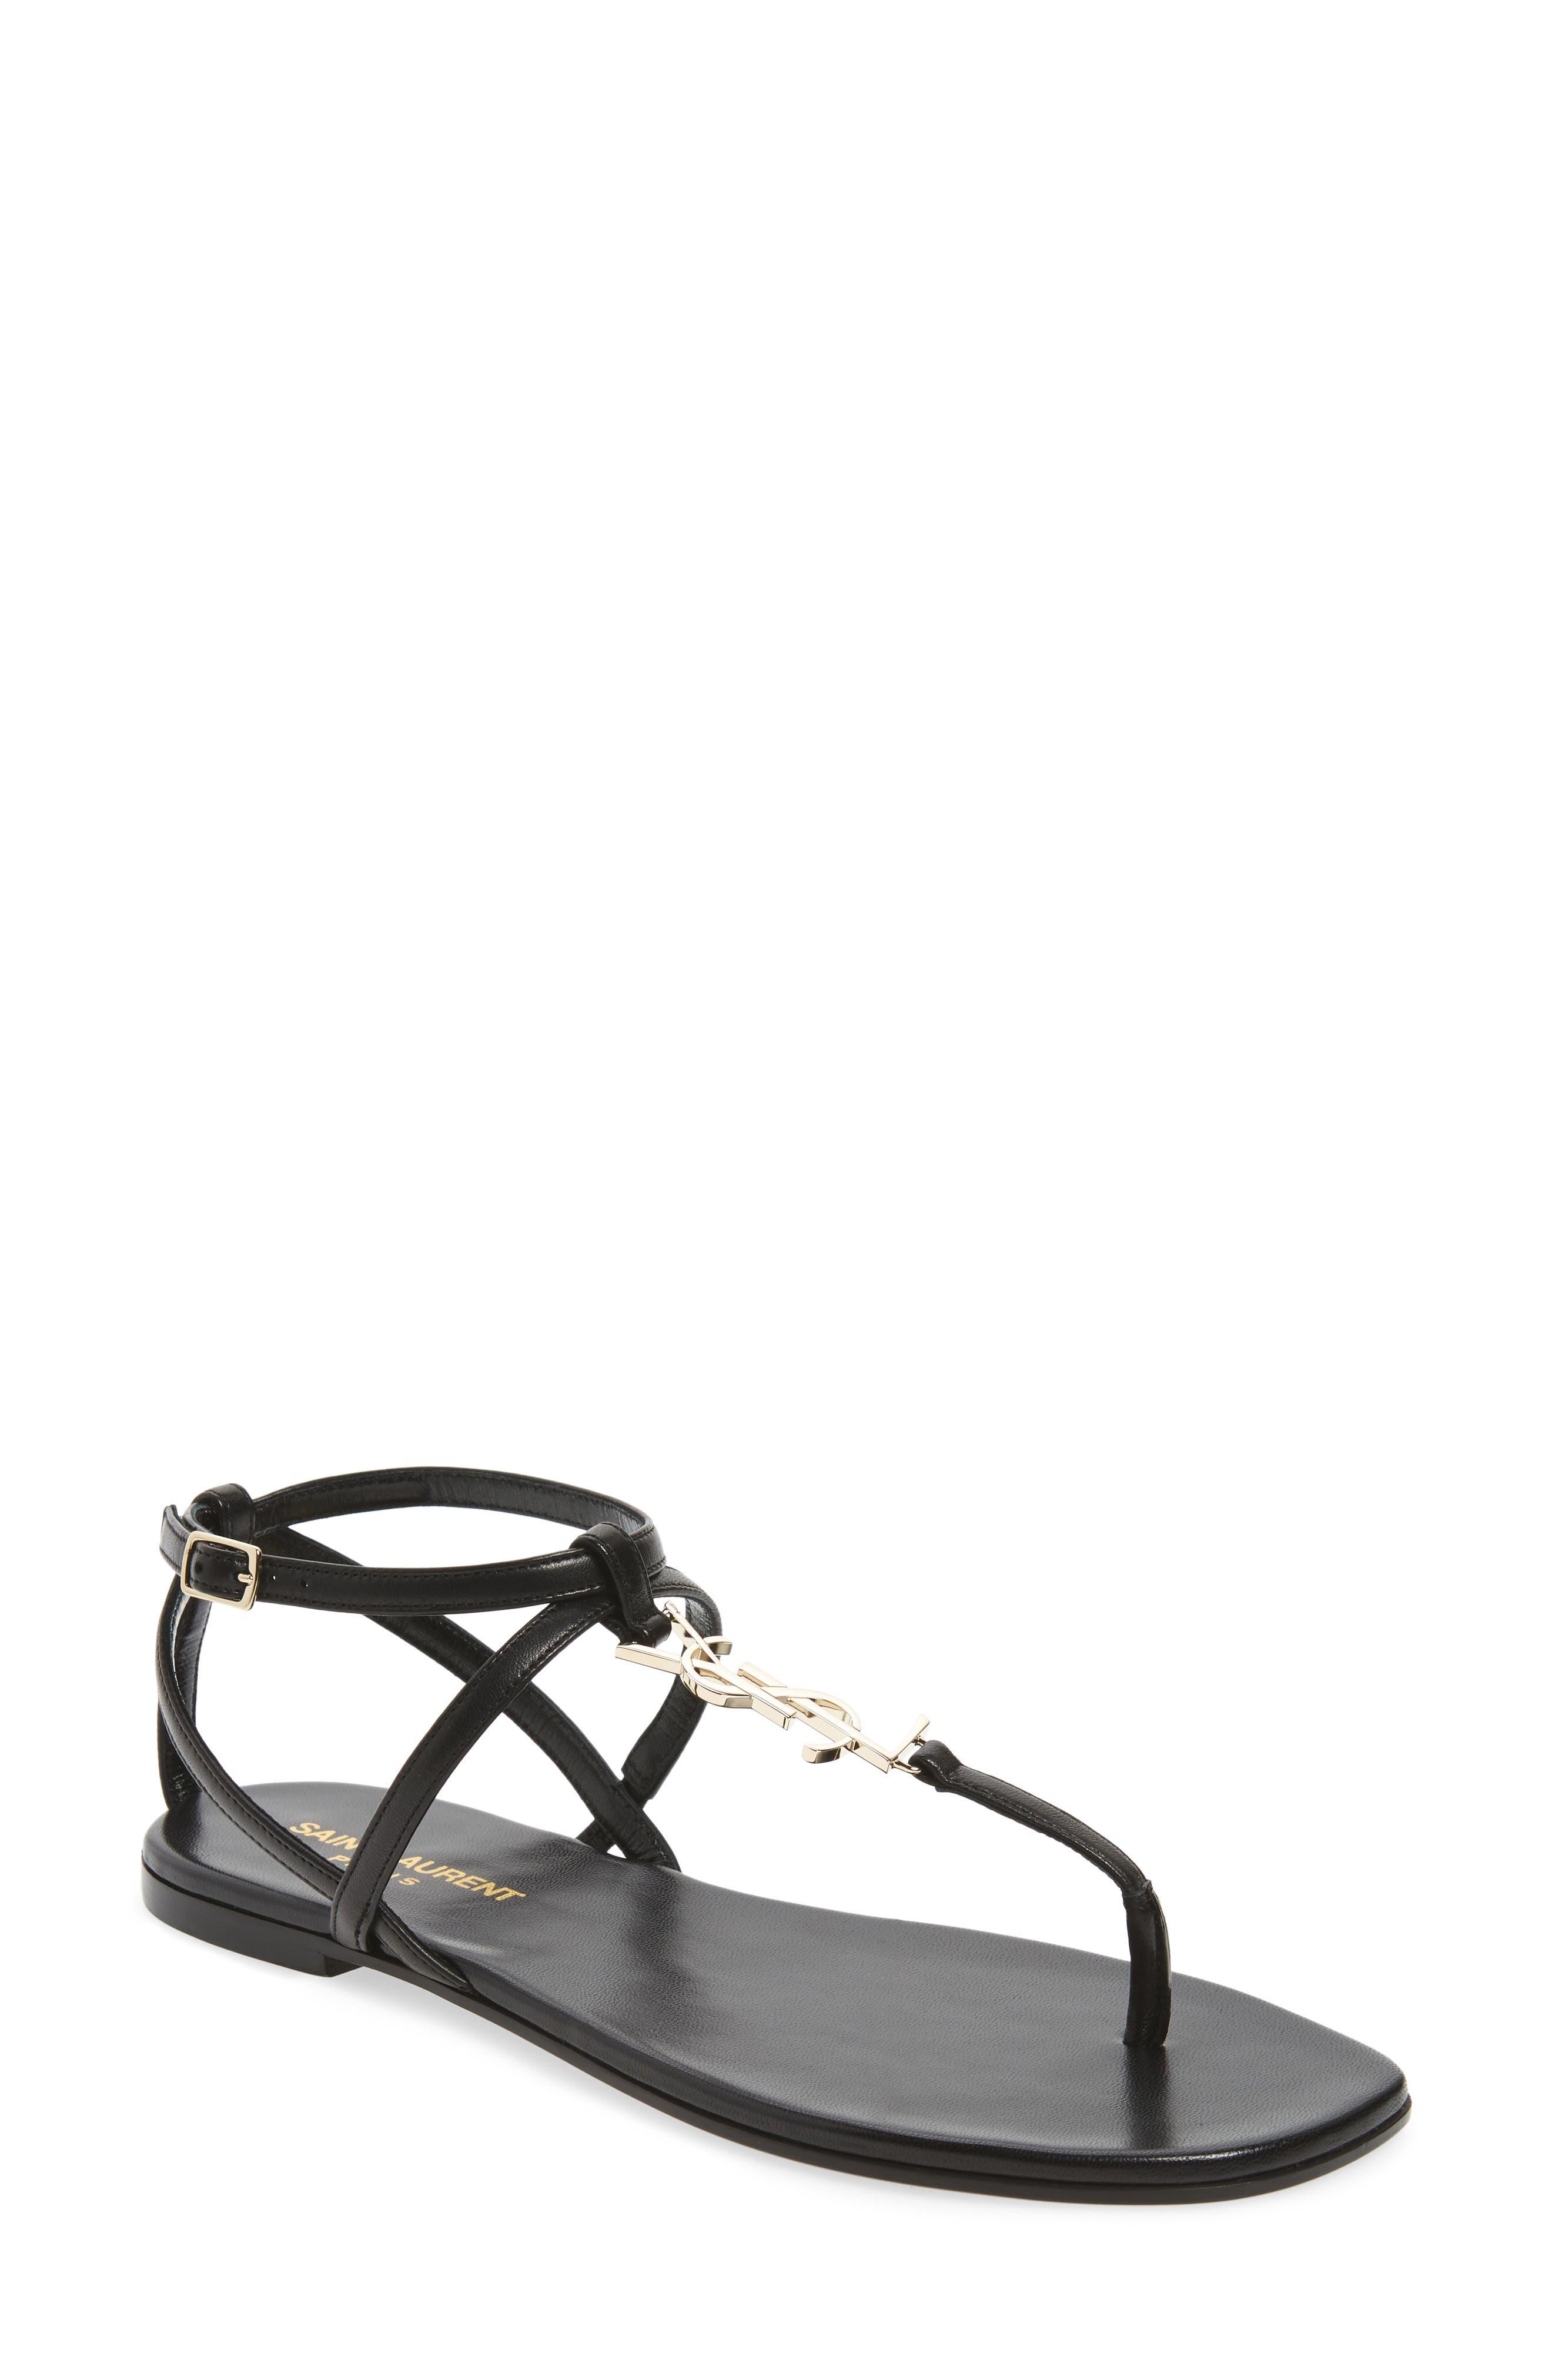 Nu Pied T-Strap Sandal,                         Main,                         color, BLACK/ GOLD